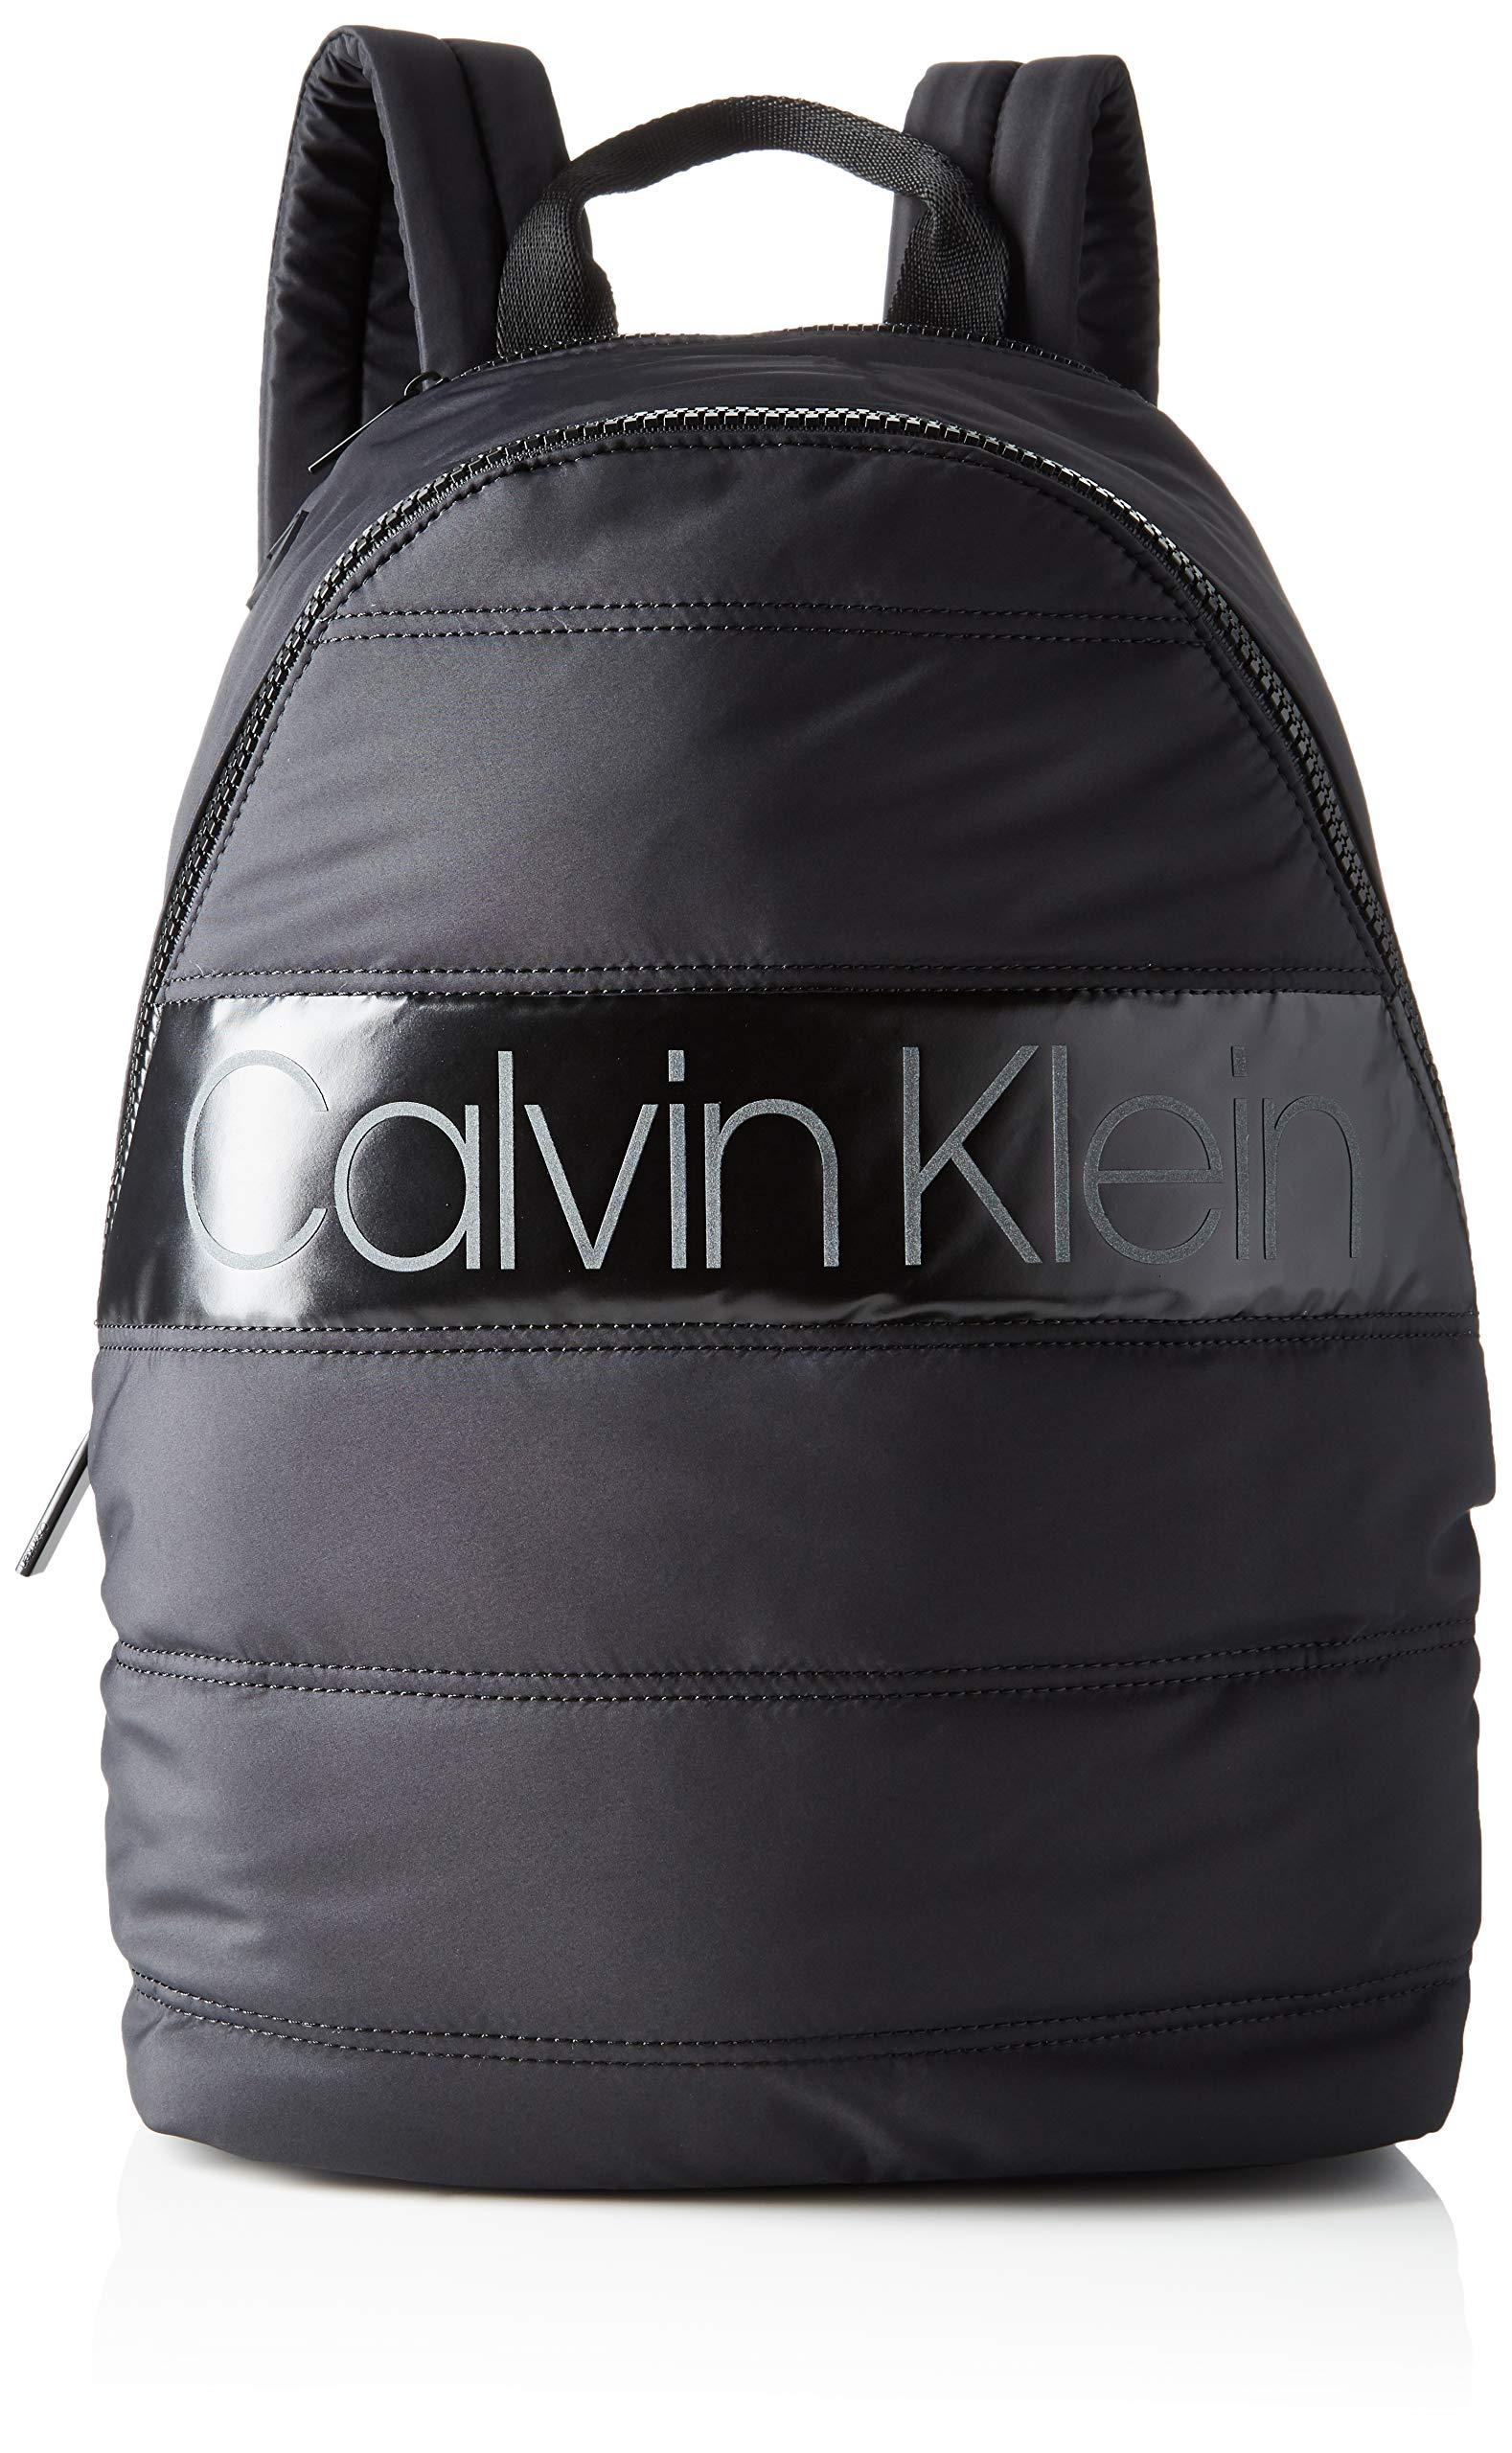 BackpackSacs L Puffer Cmw Round X Calvin H Portés Épaule HommeNoirblack1x1x1 Klein rCWBodeQx